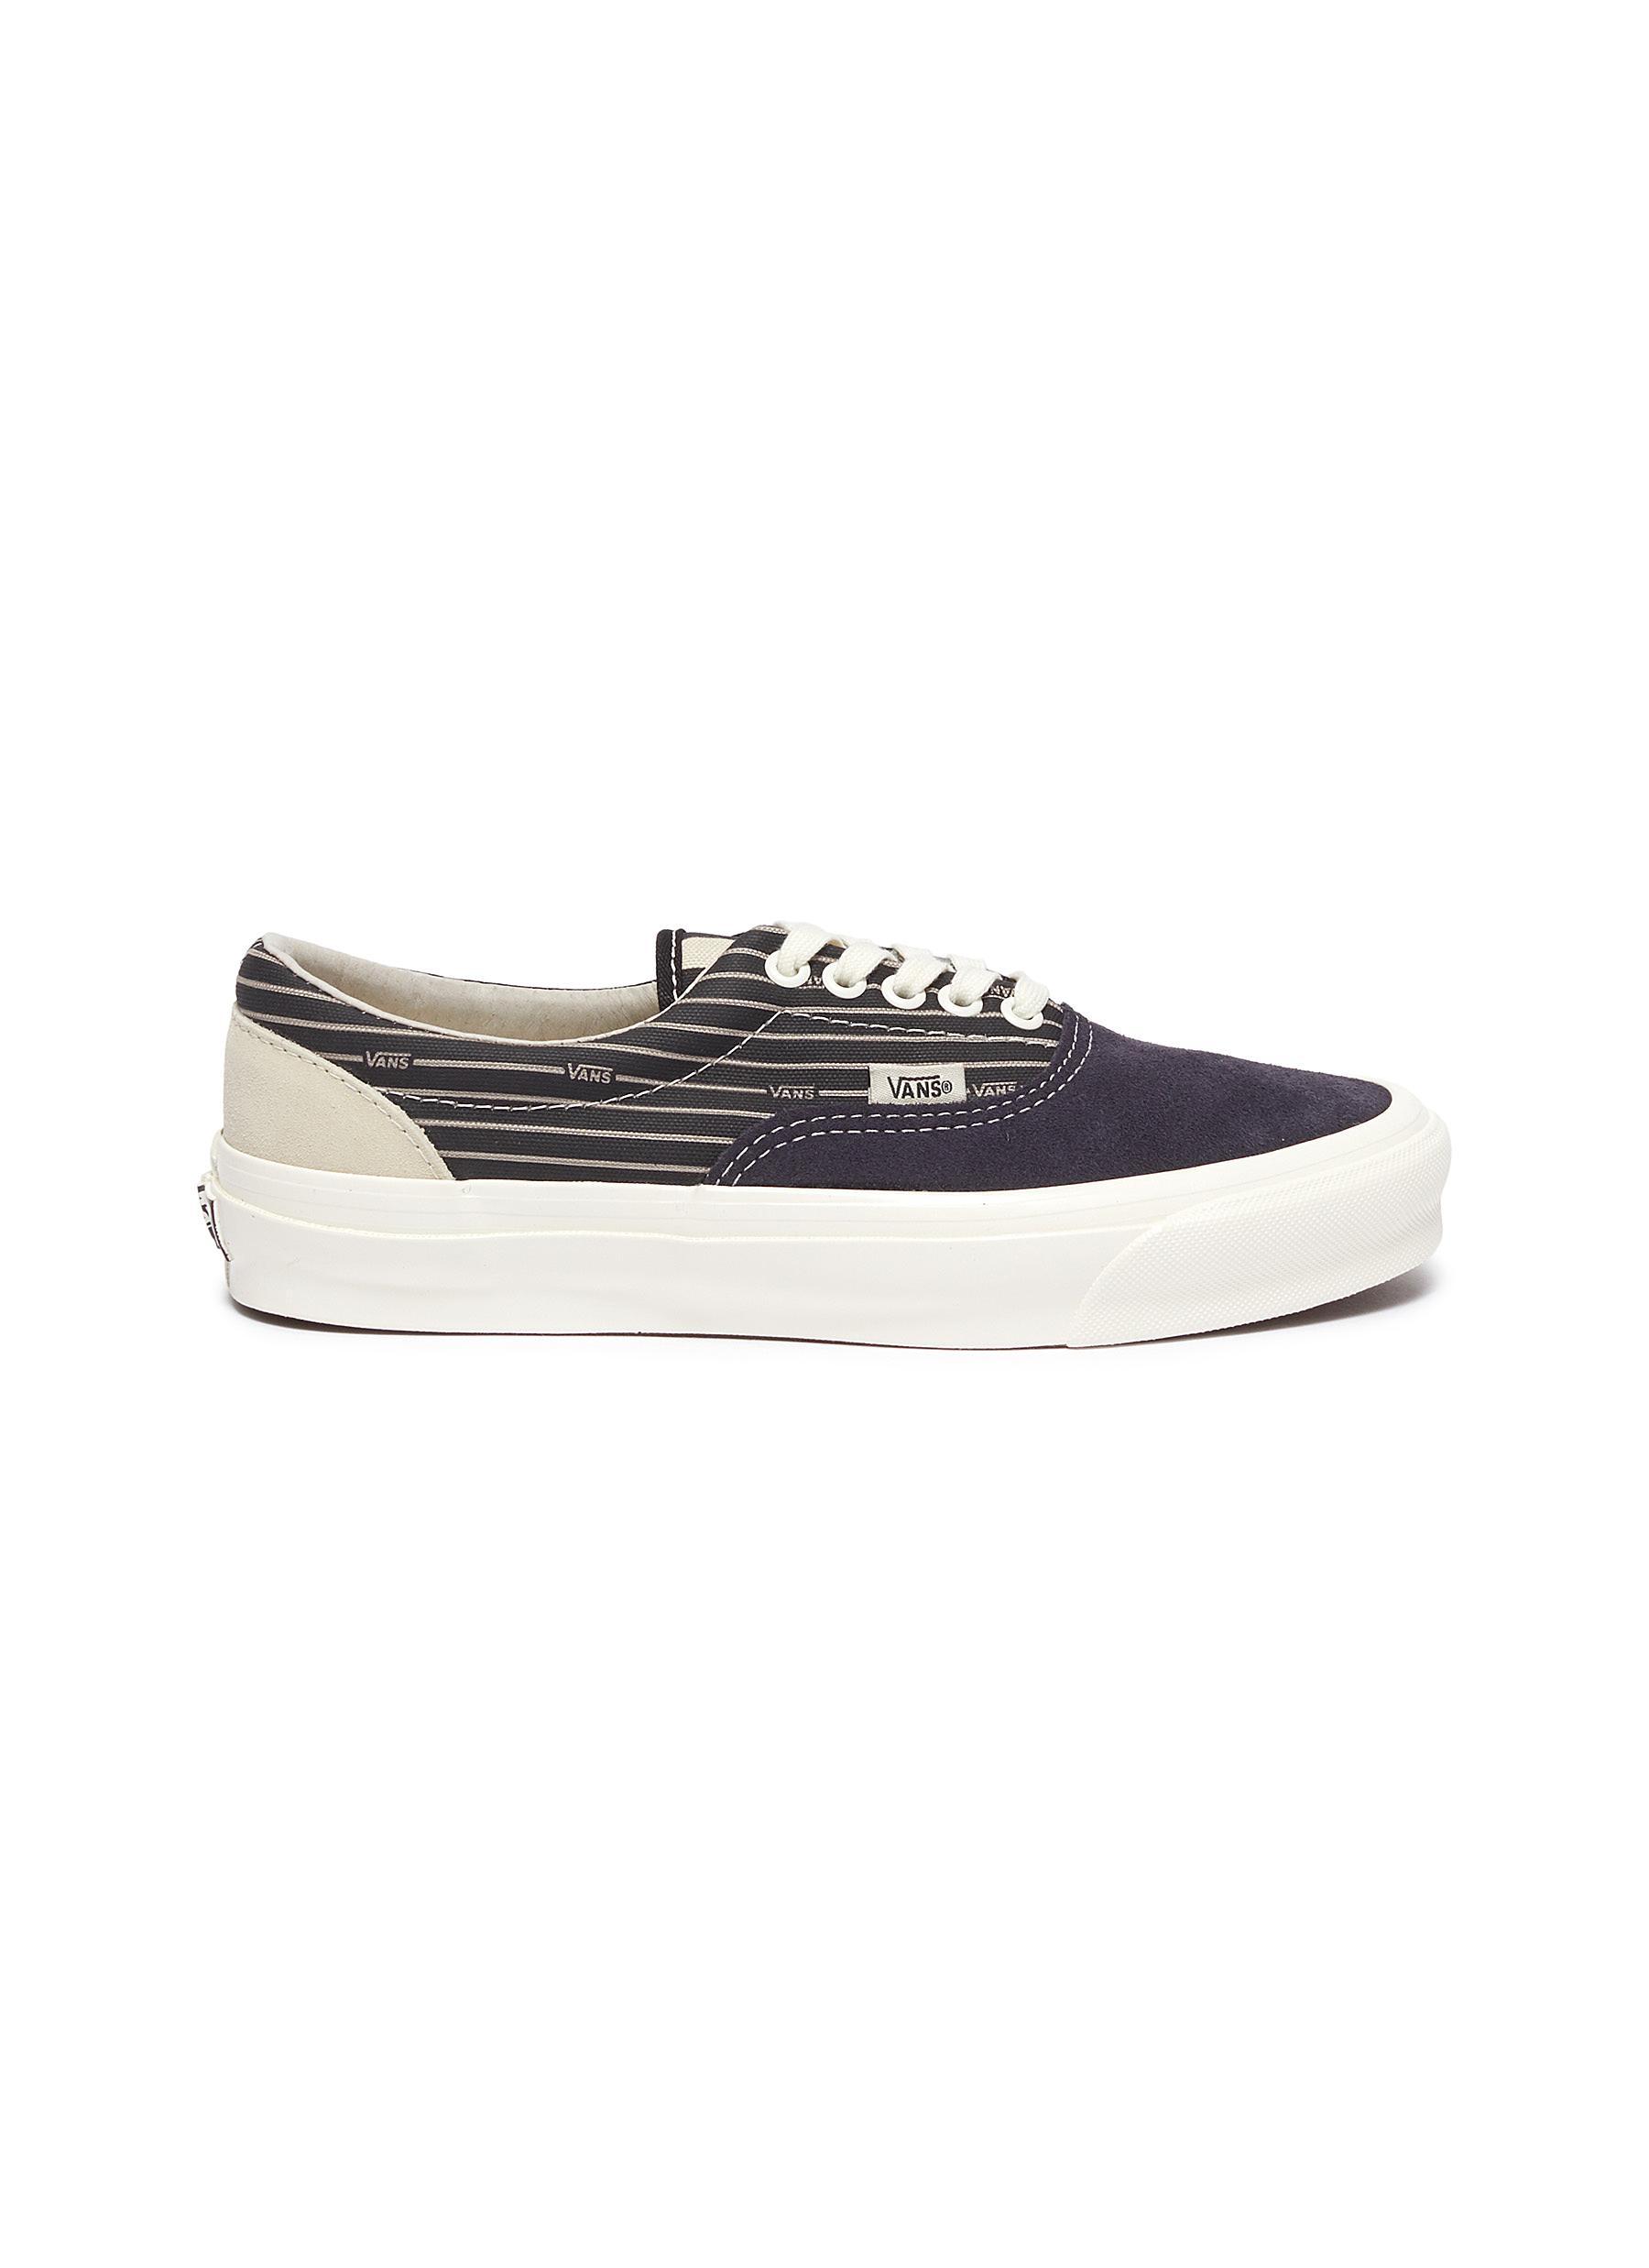 OG Era' LX Lace-up skate sneakers